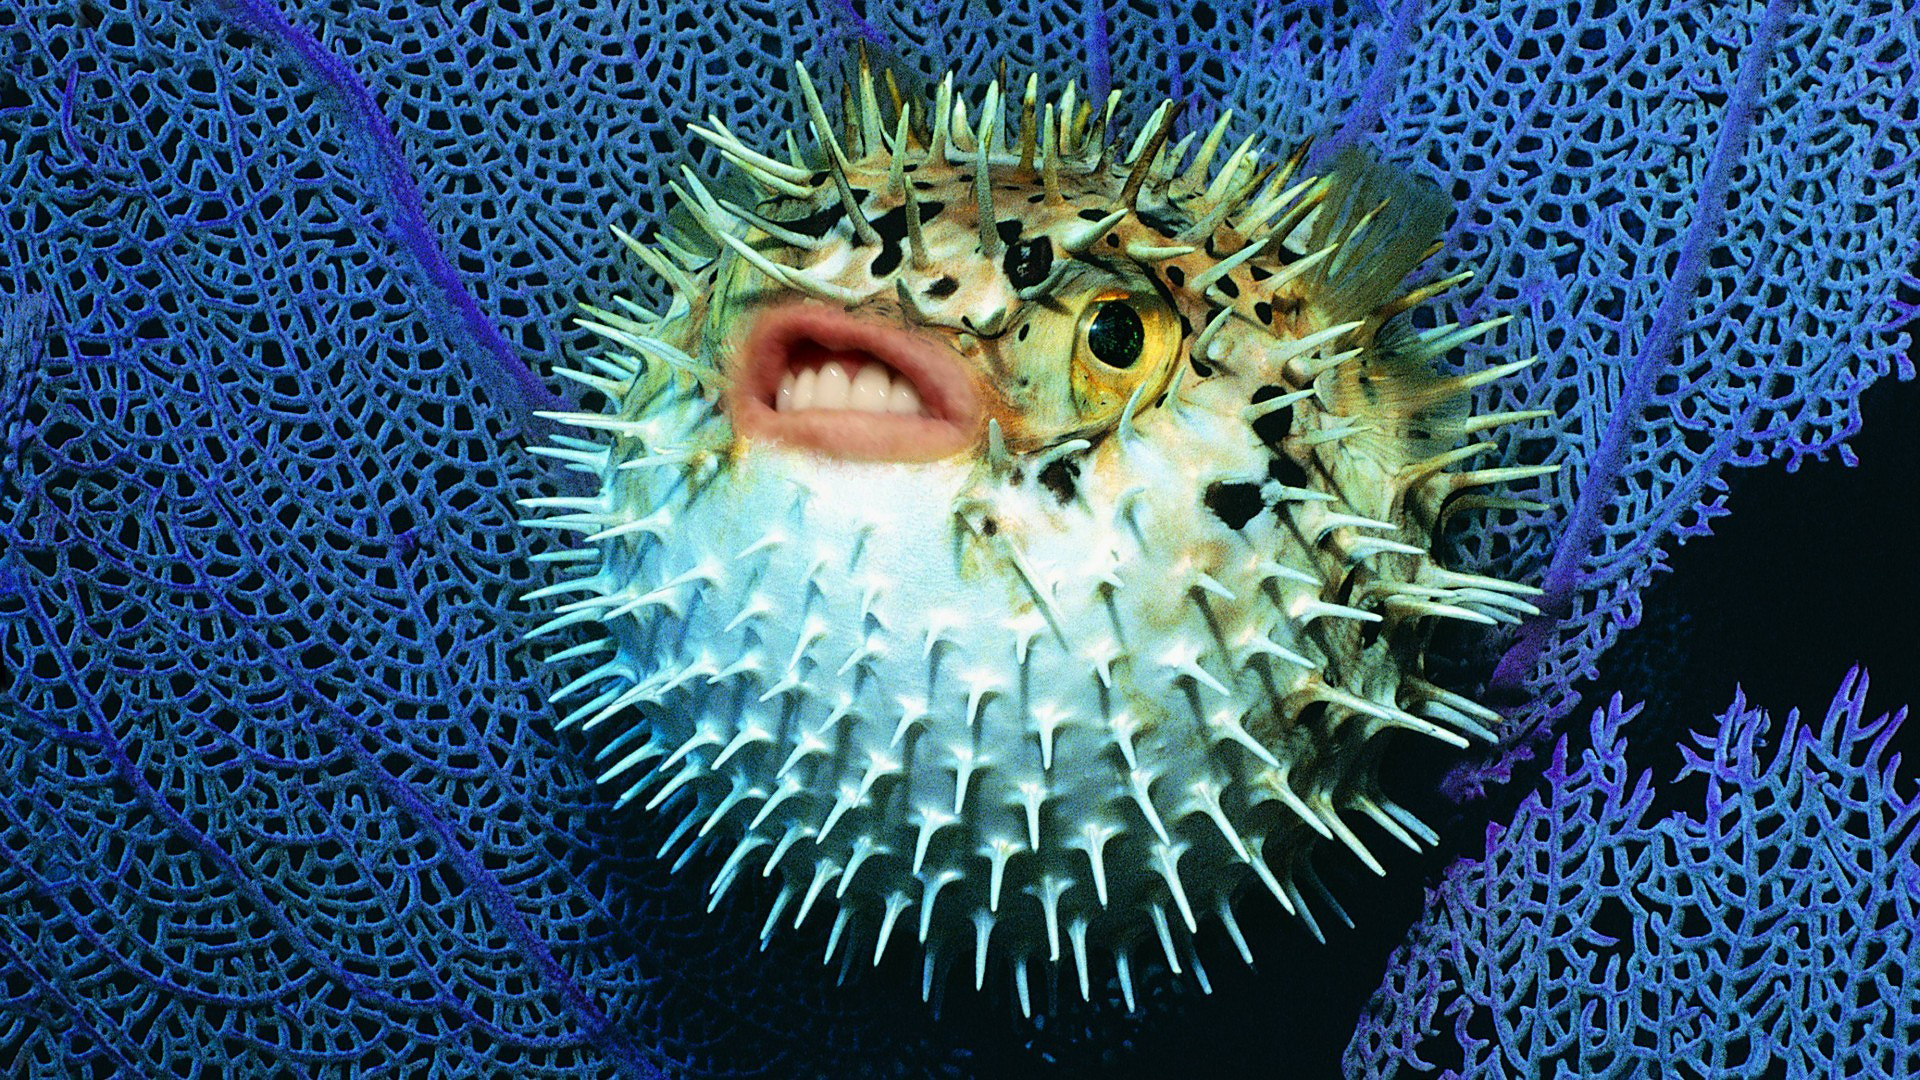 High Resolution Wallpaper   Pufferfish 1920x1080 px